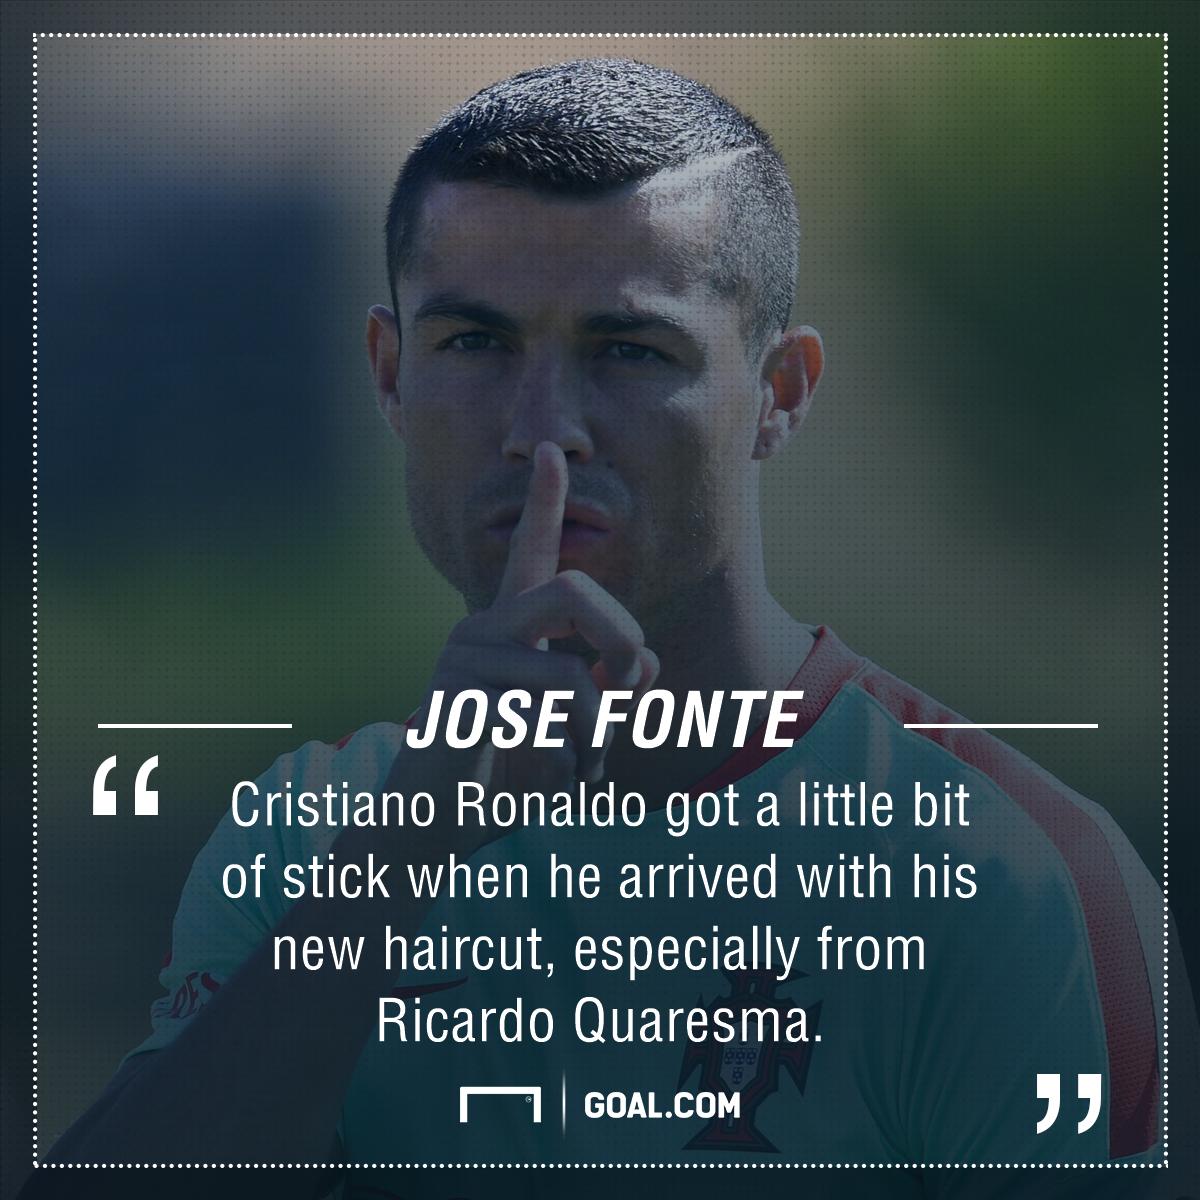 Cristiano Ronaldo Jose Fonte haircut